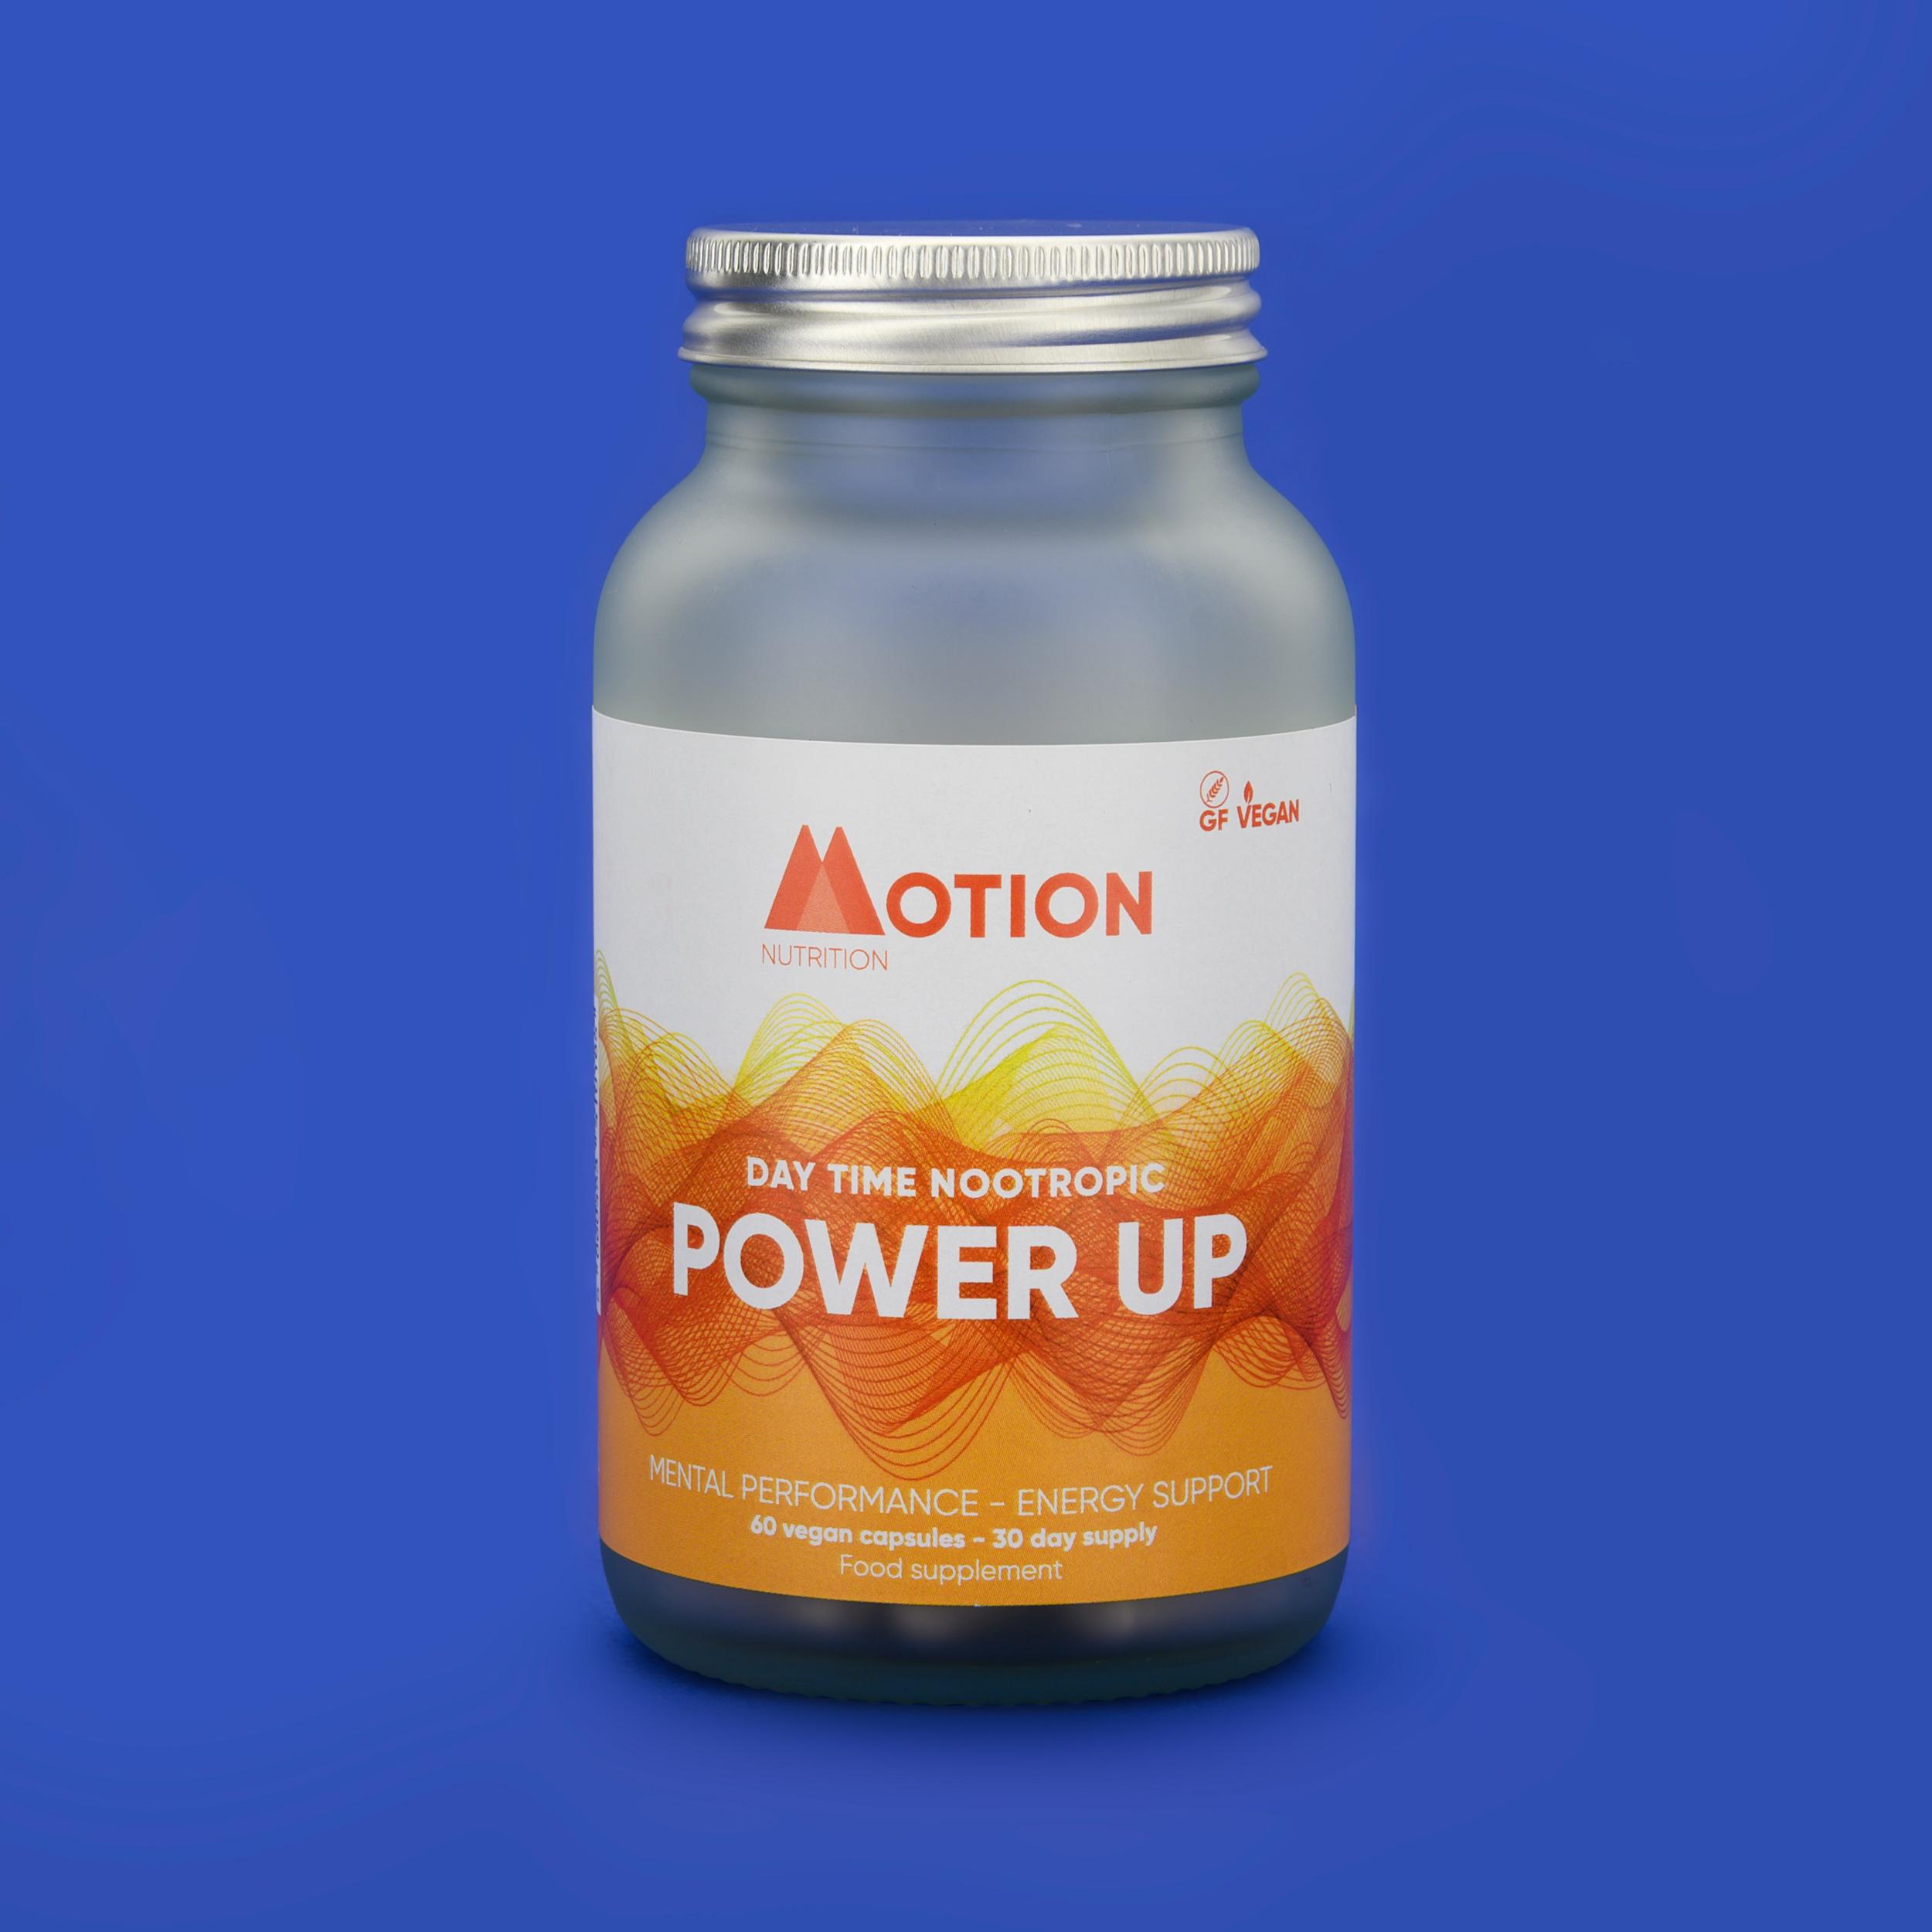 Buzzbar client spotlight: Motion Nutrition